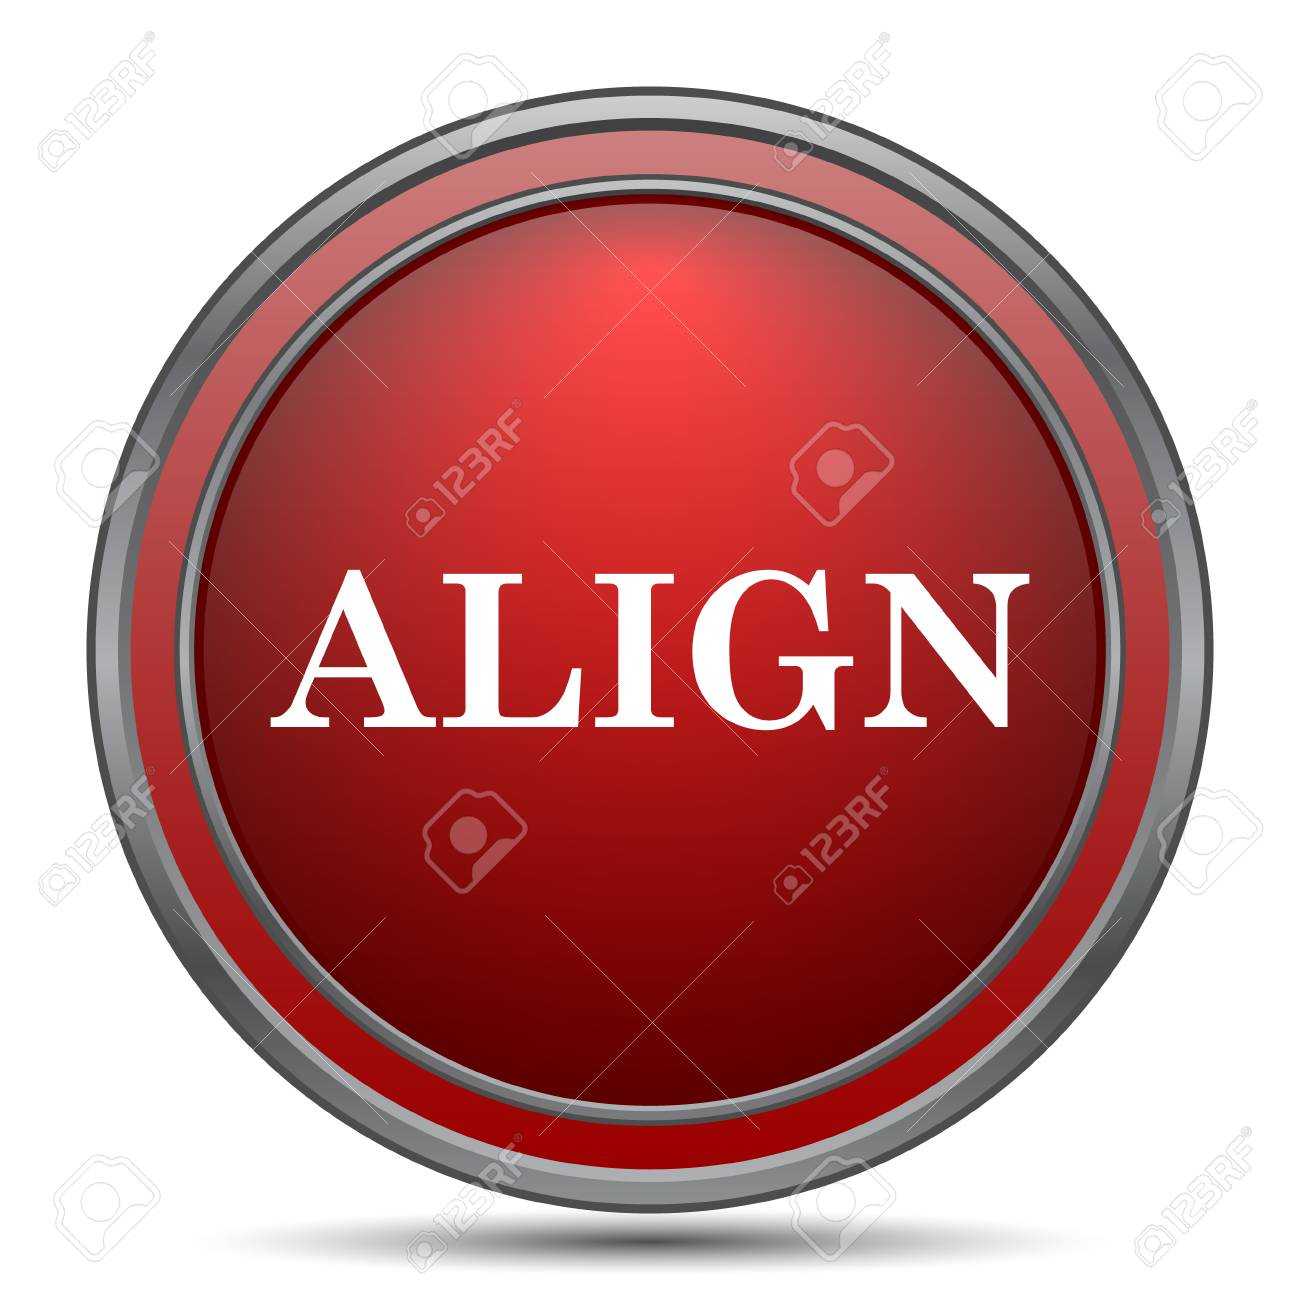 Background image align - Align Icon Internet Button On White Background Stock Photo 64817782